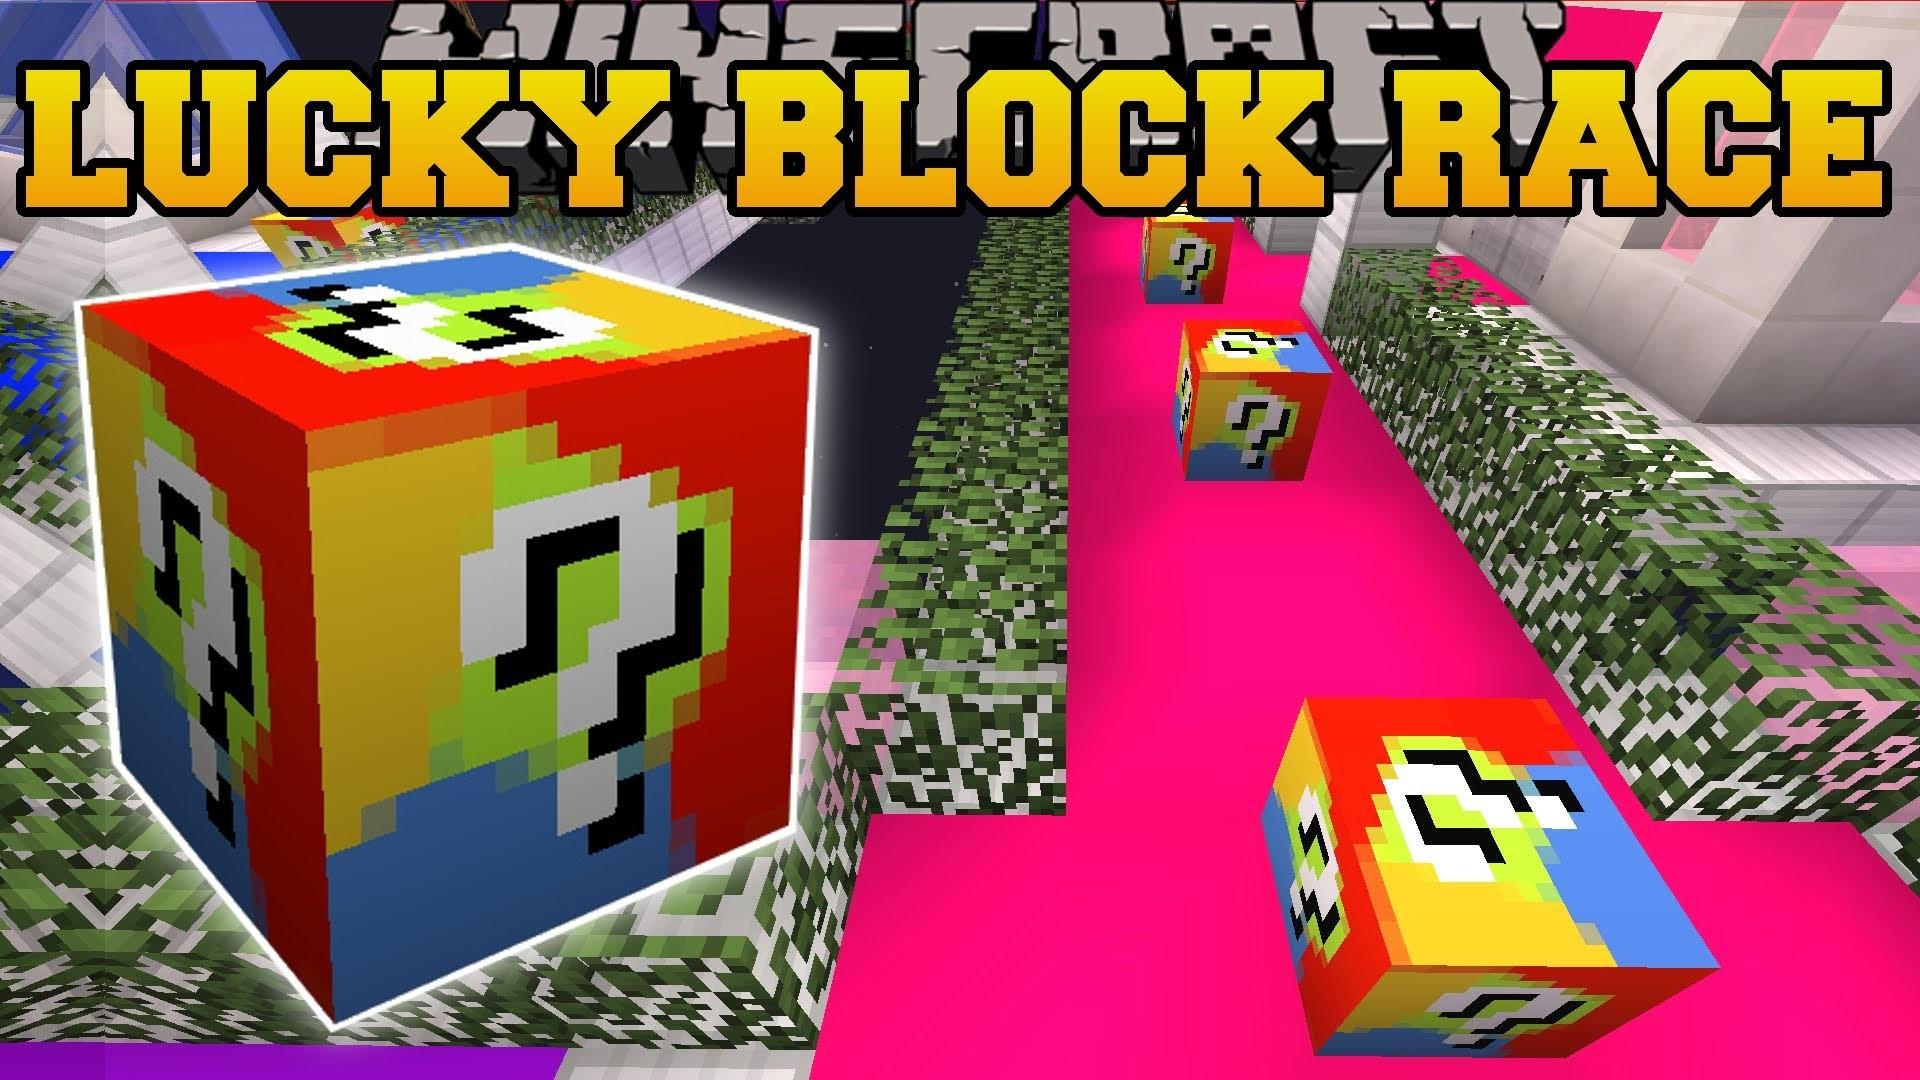 PAT And JEN PopularMMOs | Minecraft FUTURE WORLD LUCKY BLOCK RACE – Lucky  Block Mod – Modded Game